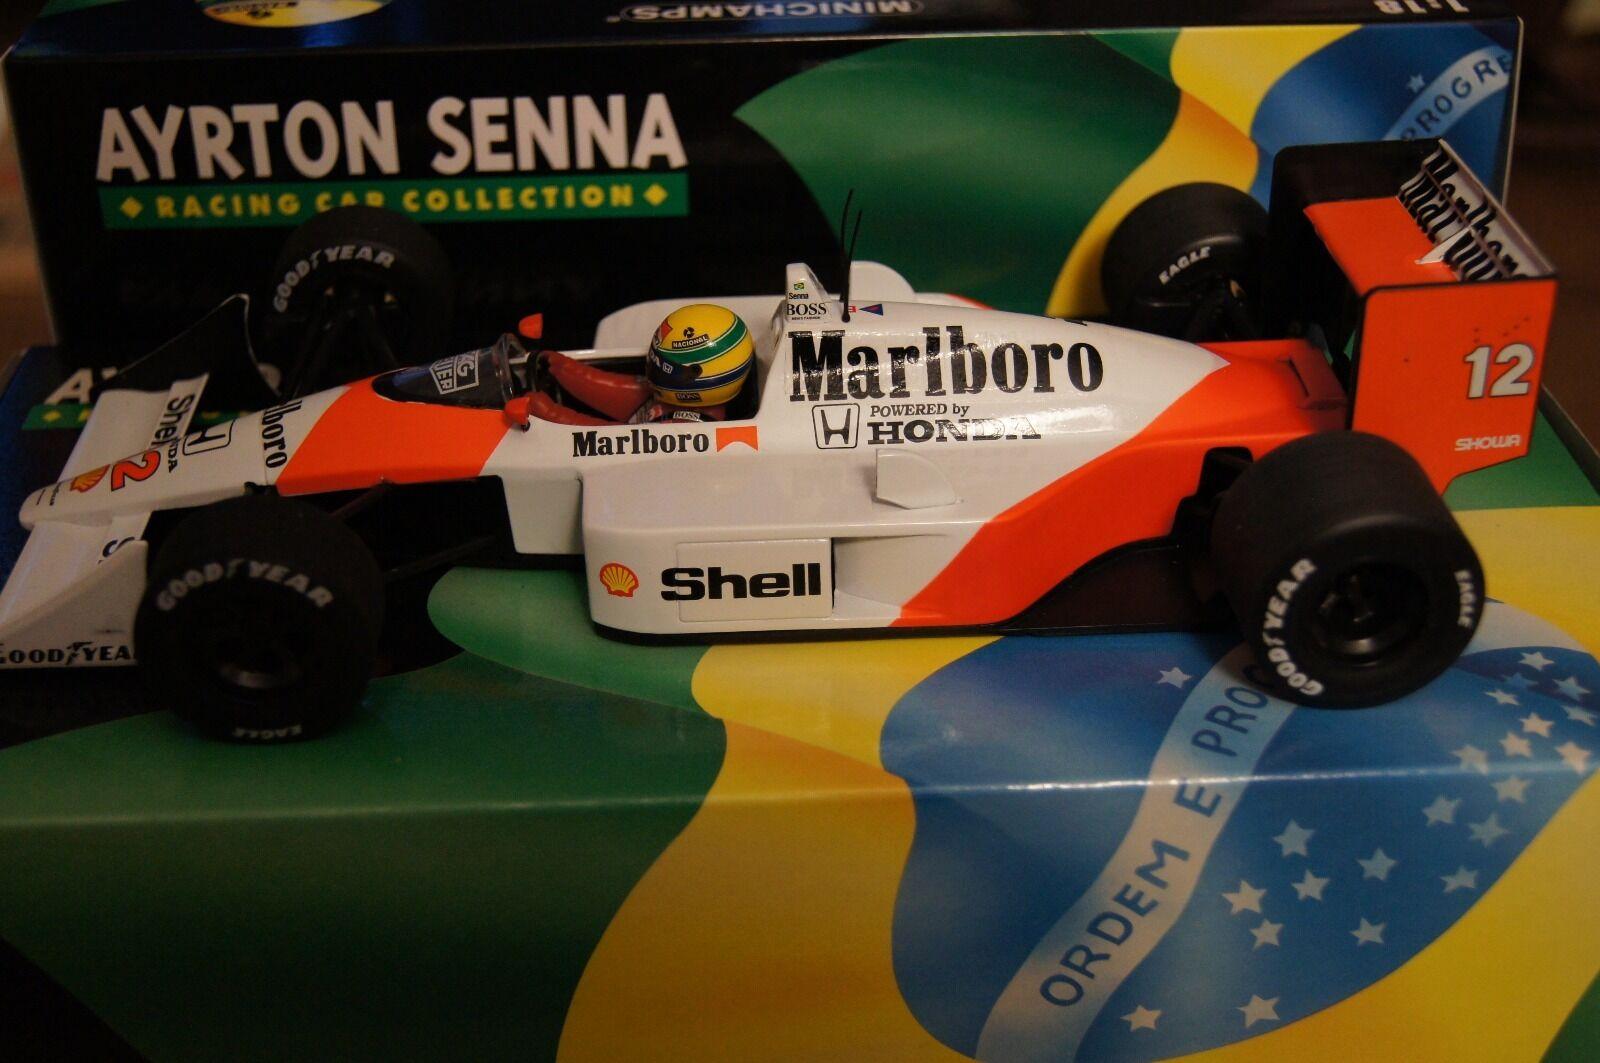 Ayrton Senna Minichamps Mp4 4 Marlbgold Mclaren full detail